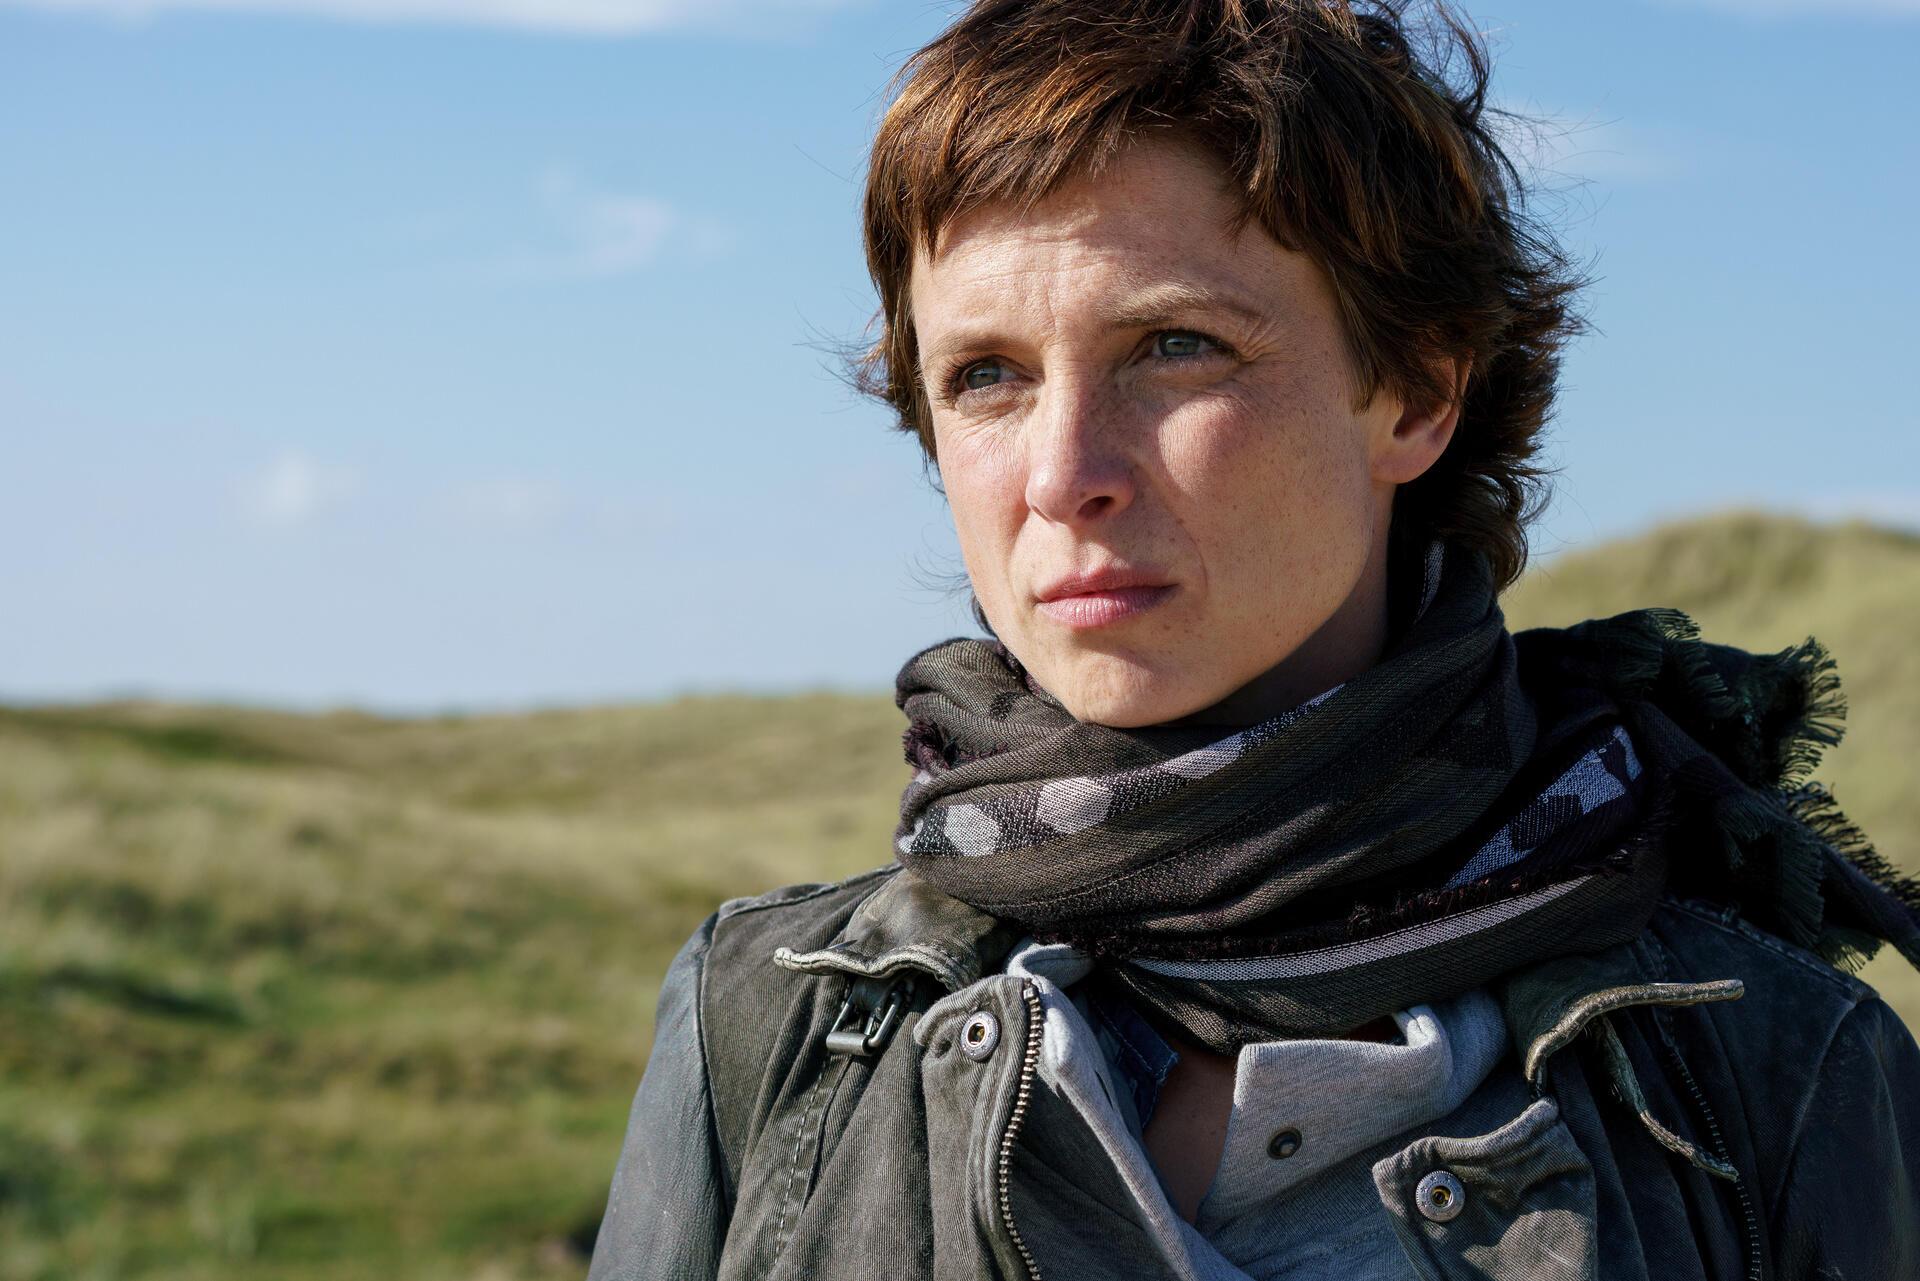 Julia Brendler | Bild 41 von 48 | moviepilot.de